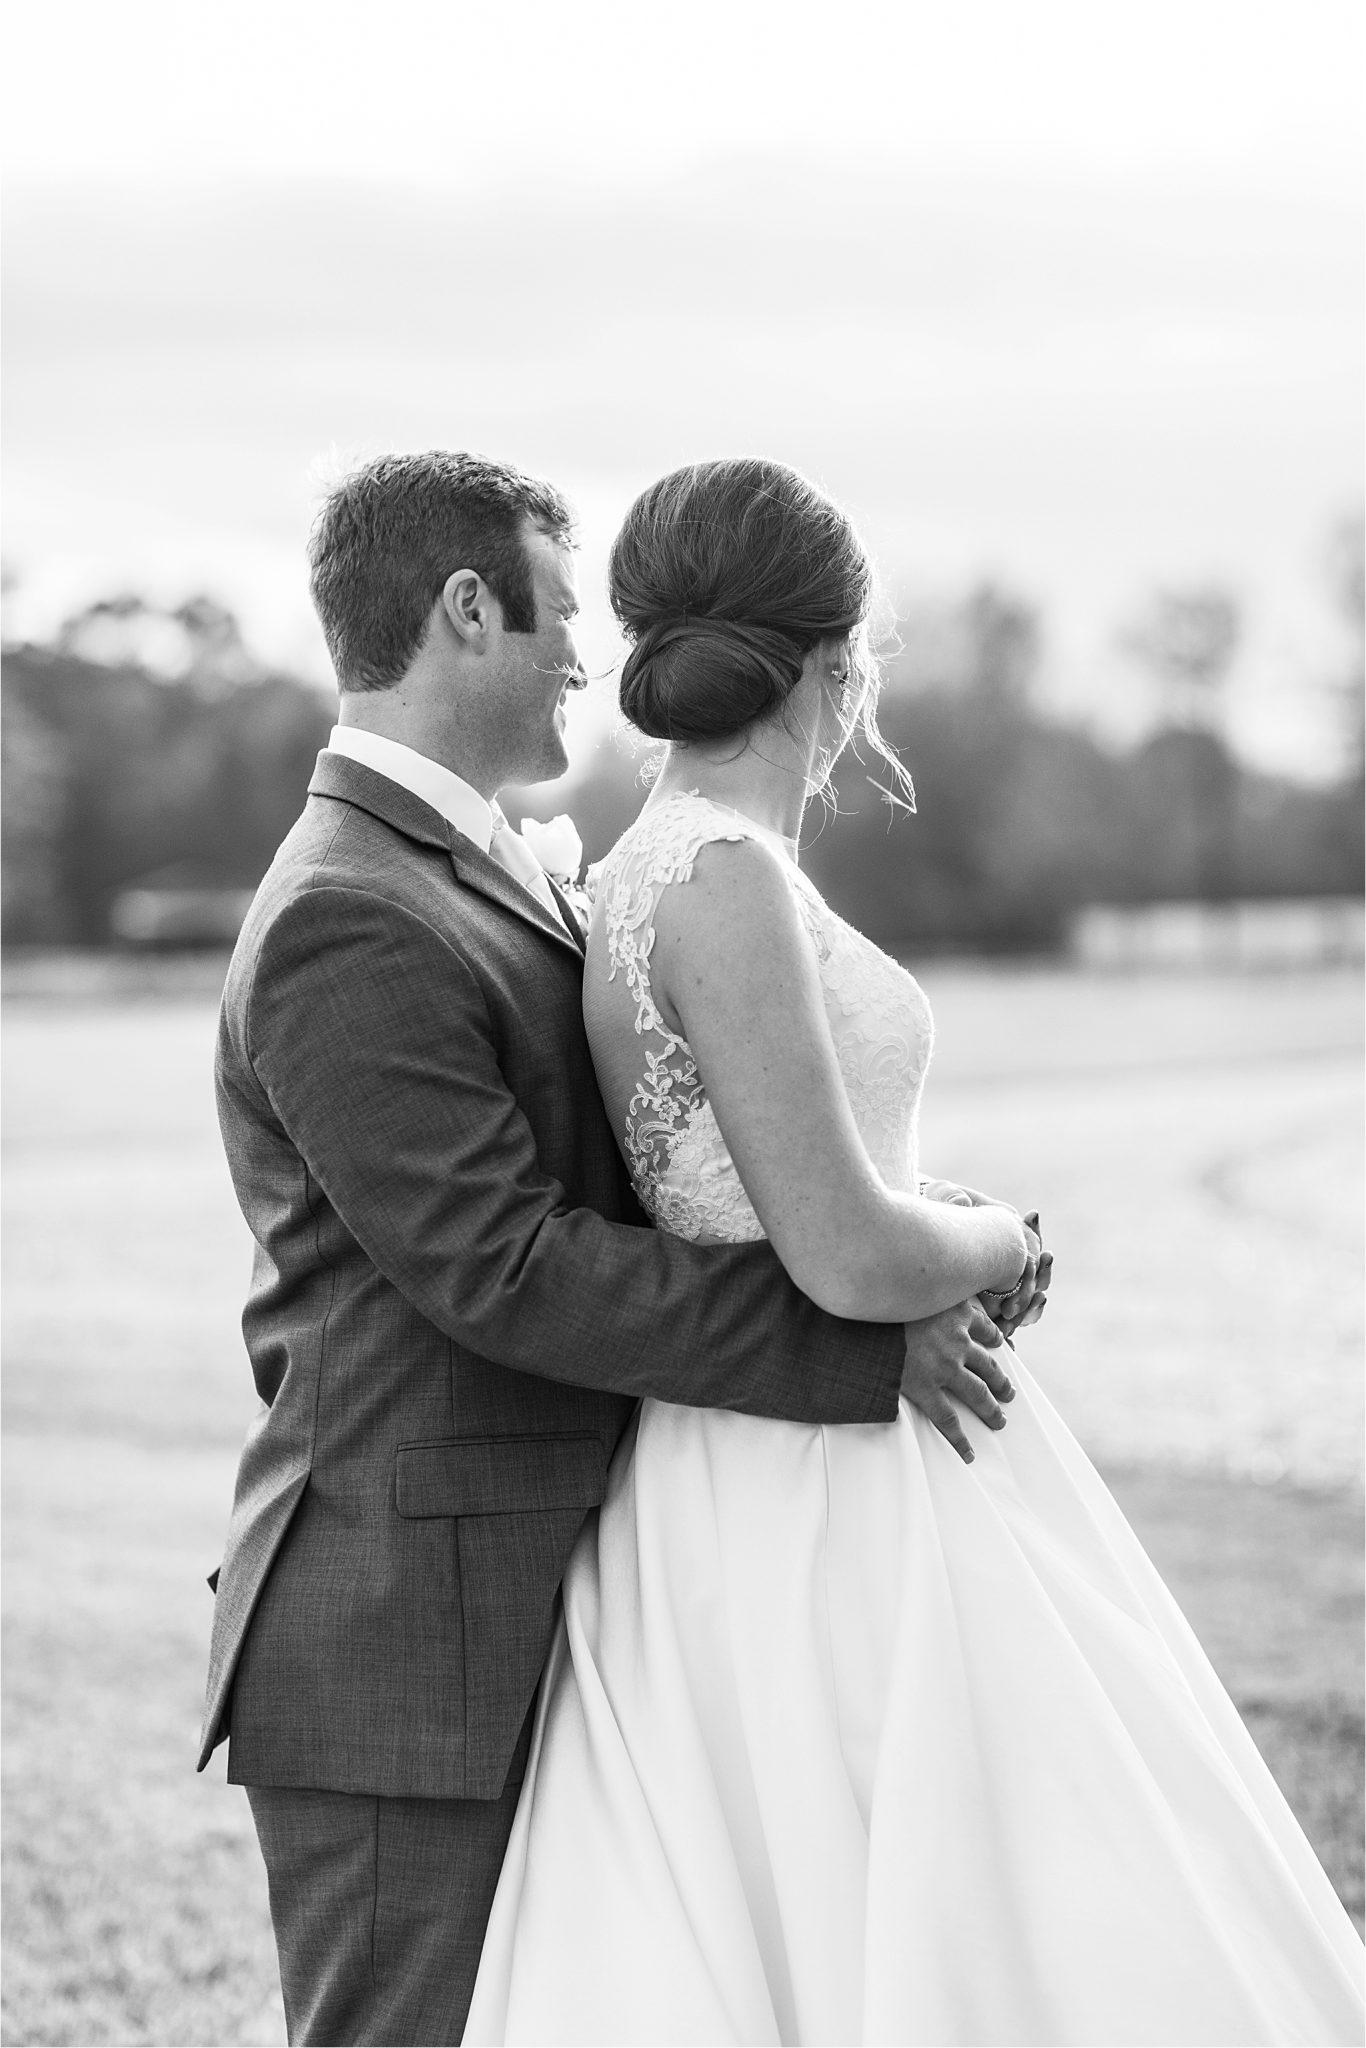 The Barn at Bridlewood Wedding-Hattiesburg, Mississippi-Kelsey + Blake-Wedding details-Barn wedding-Ruby wedding-Autumn themed wedding-Bride and groom